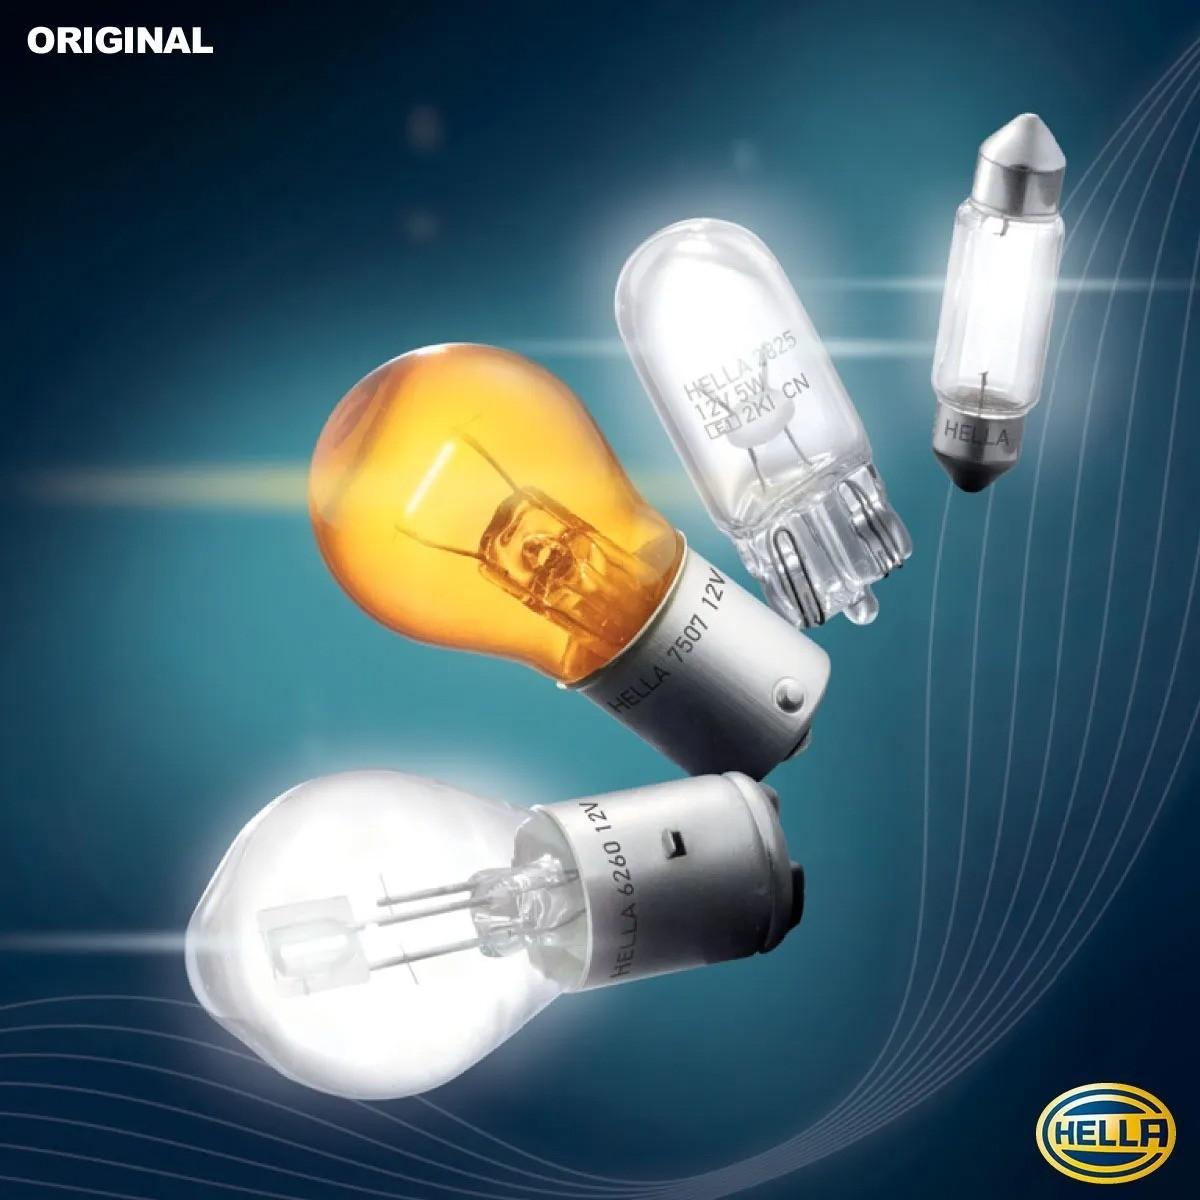 LAMPADA CONVENCIONAL 12V 19W 12V FAROL H16 UNIVERSAL HELLA